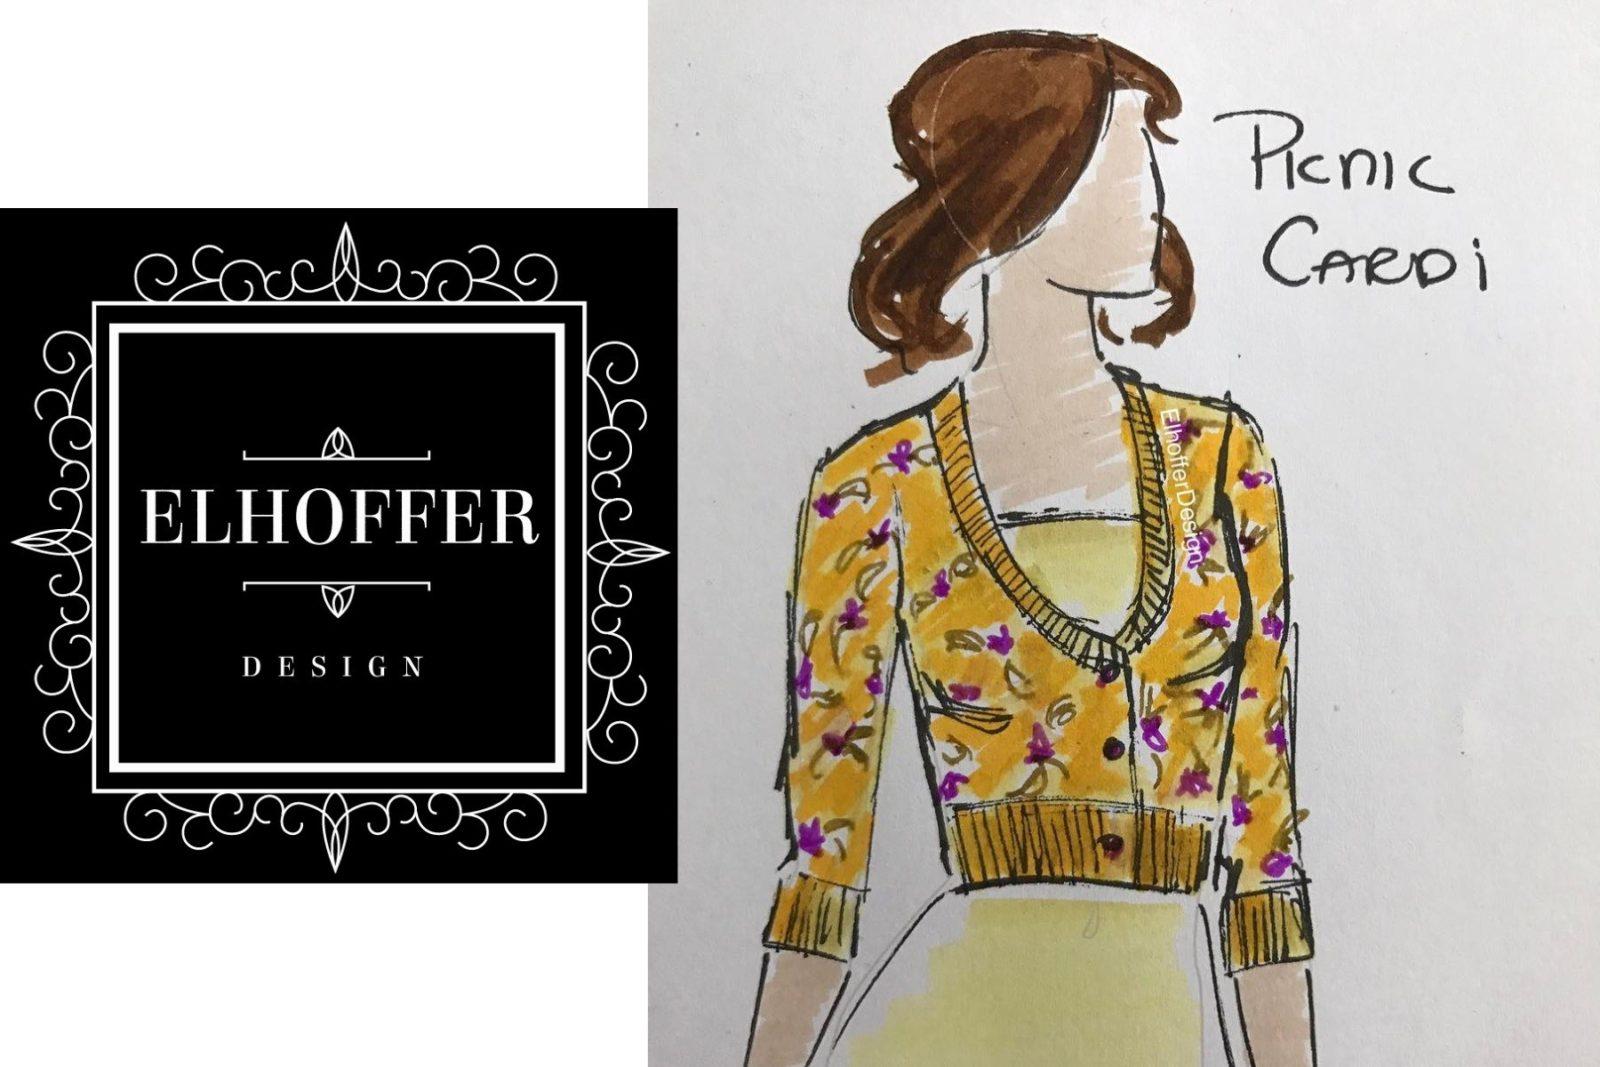 Elhoffer Design Padme' picnic cardigan!